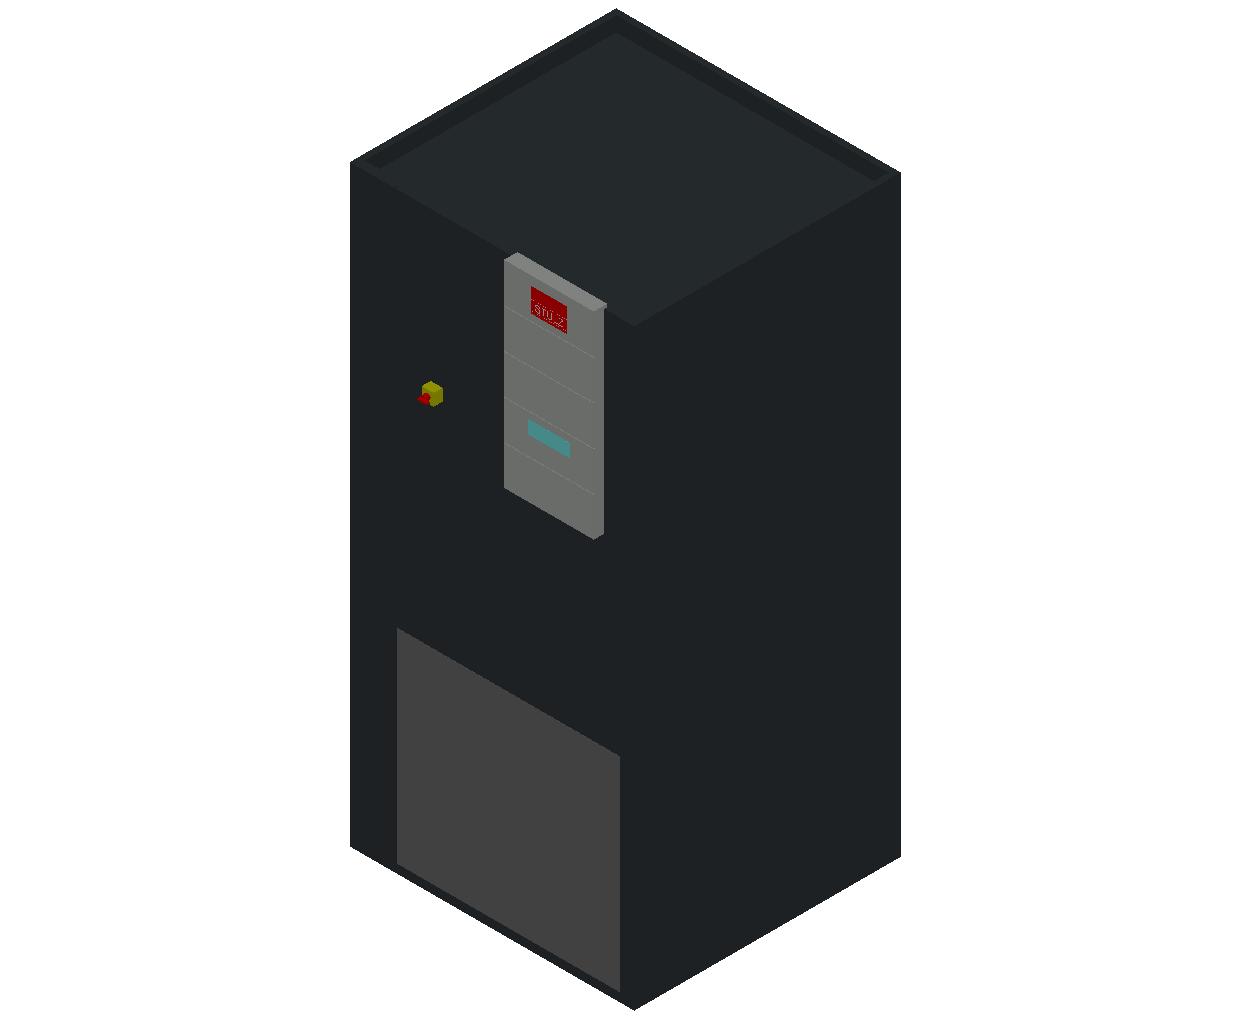 HC_Air Conditioner_Indoor Unit_MEPcontent_STULZ_CyberAir 3PRO_ASU_Single Circuit AS_ASU_261_AS_INT-EN.dwg